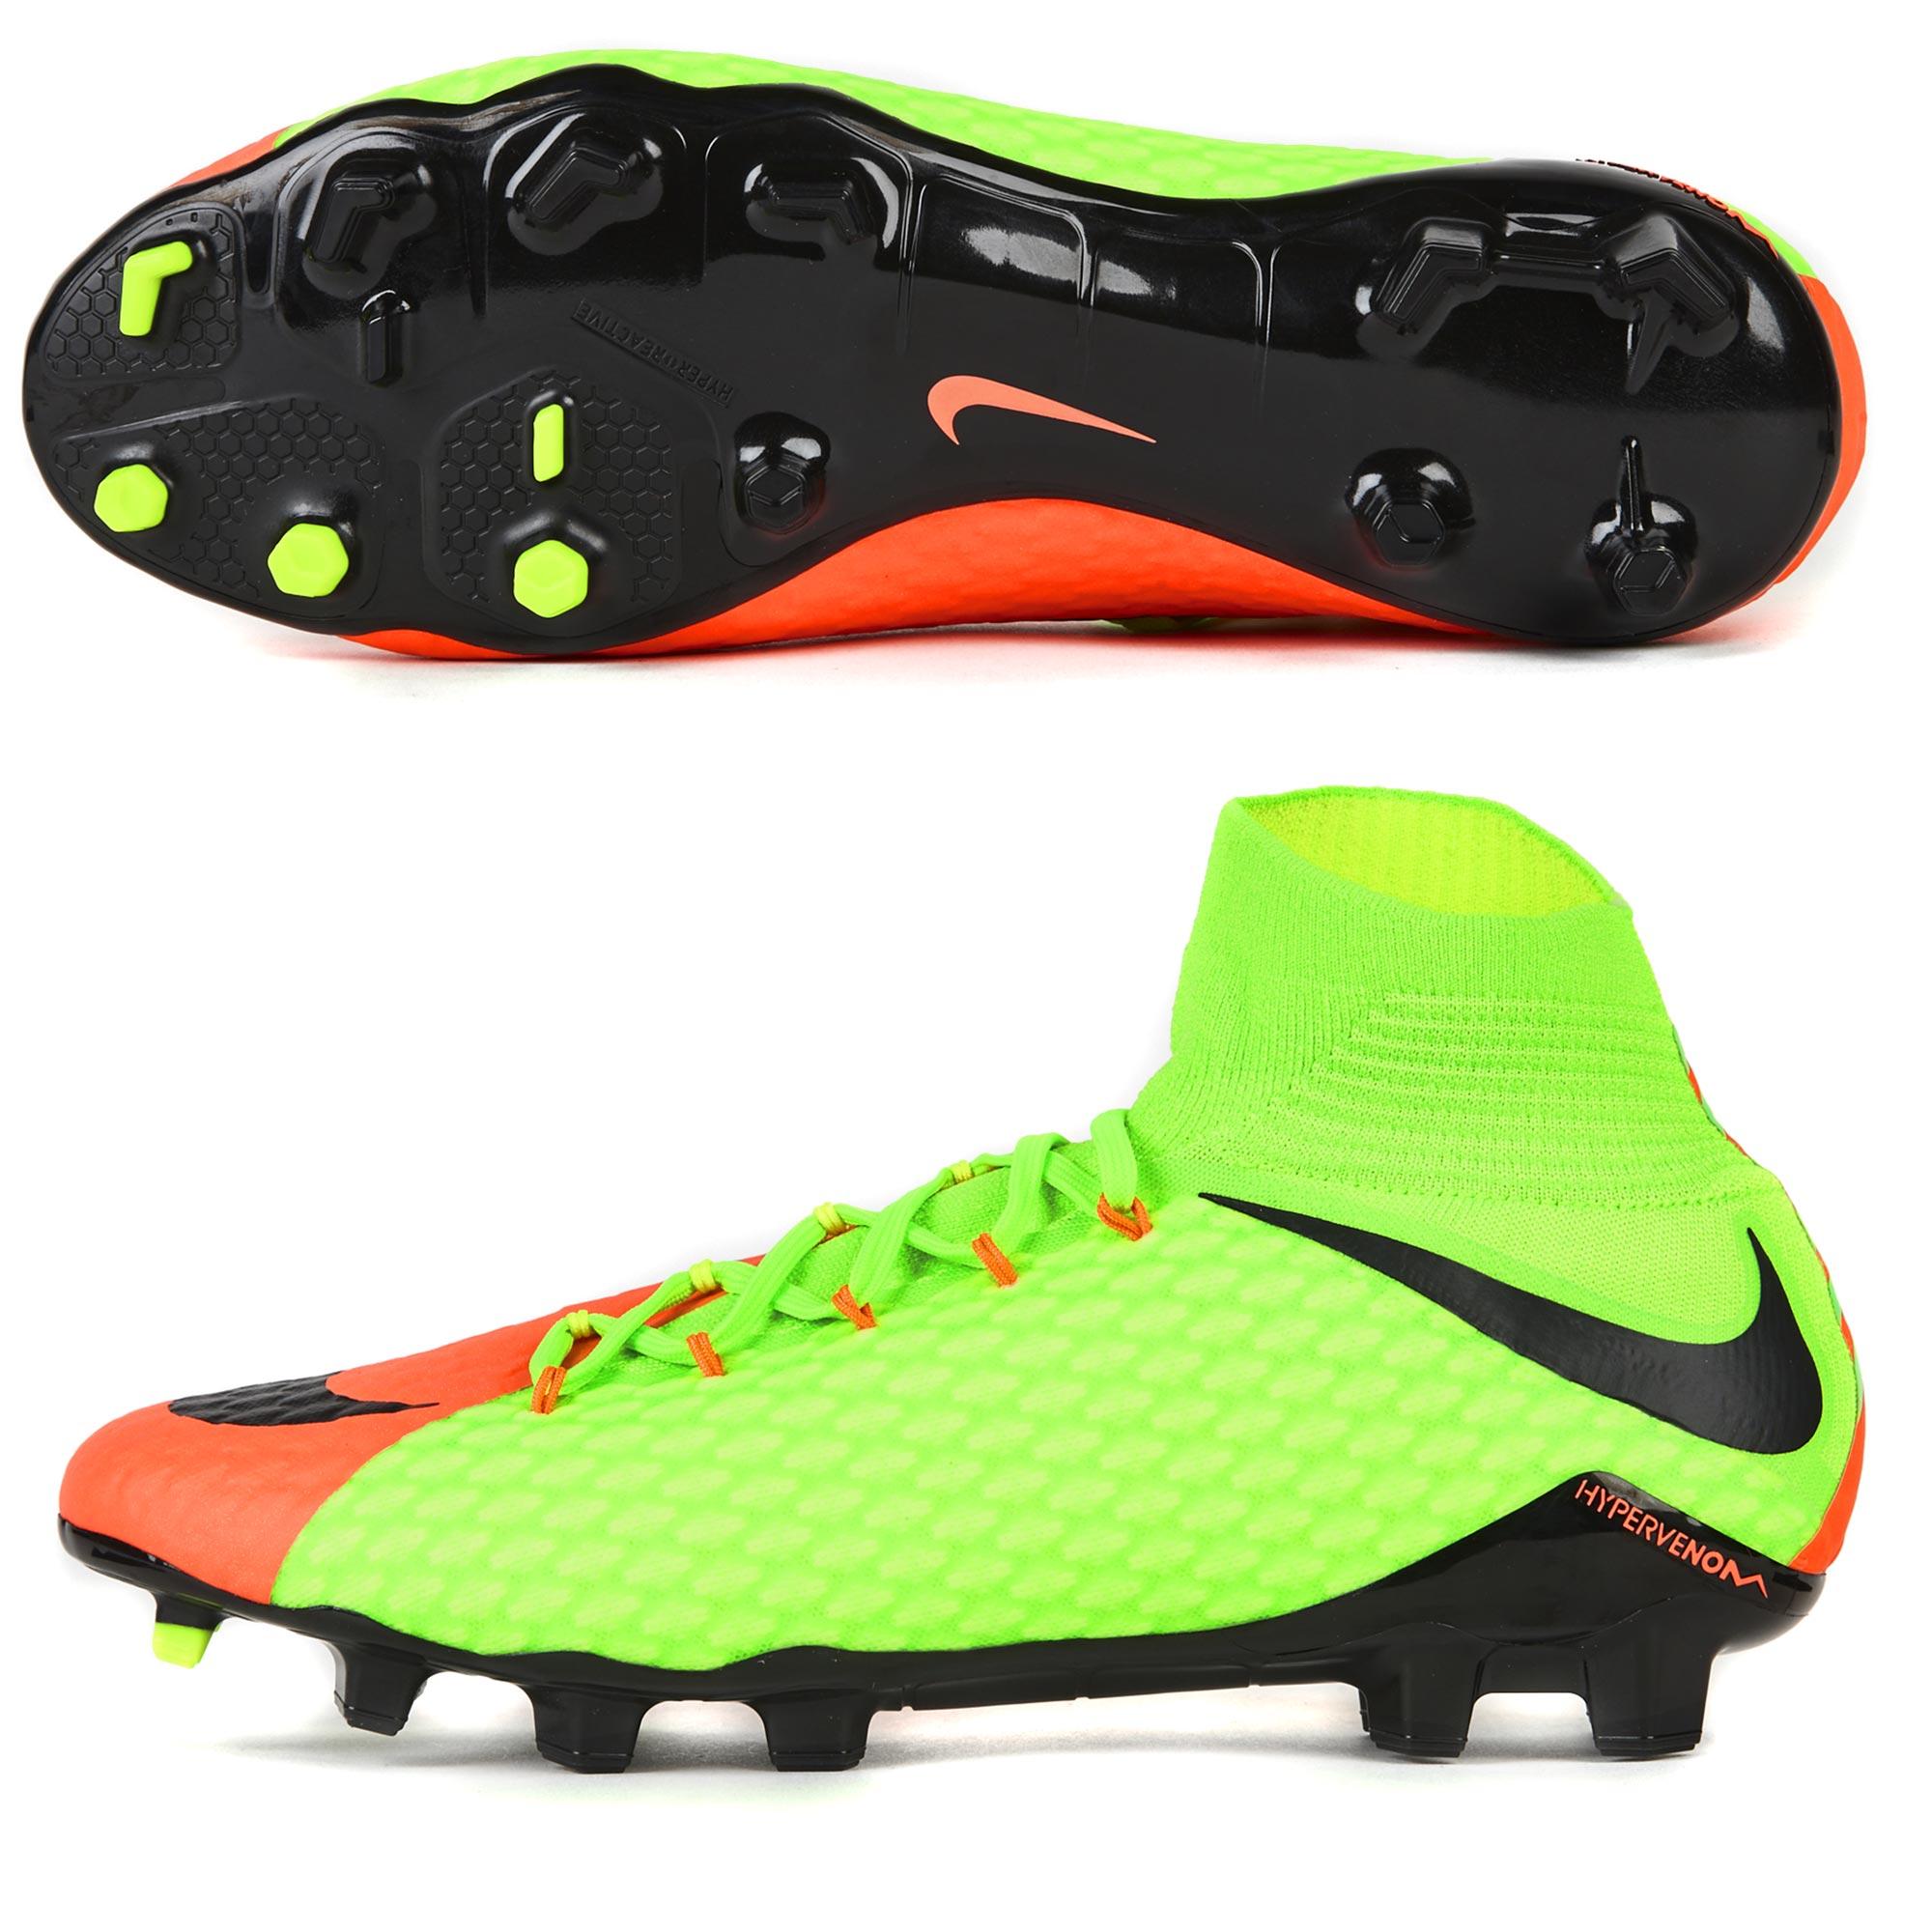 Nike Hypervenom Phatal III FG Electric Green